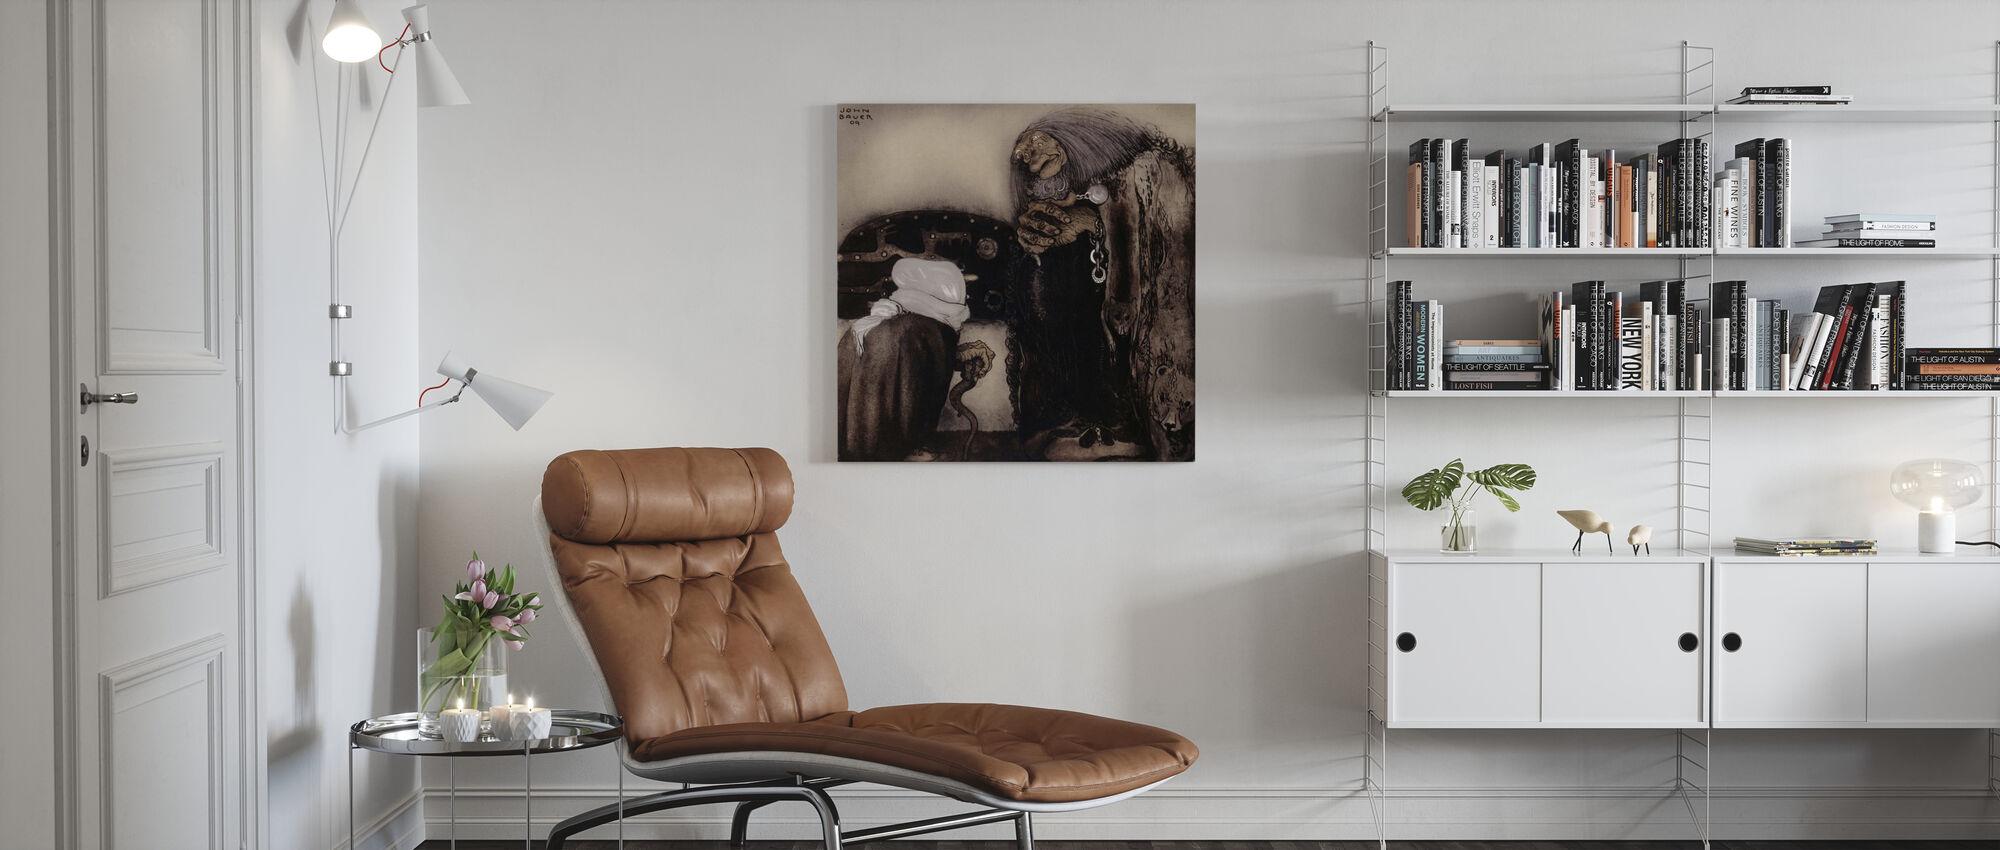 John Bauer - De fyra Stortrollen - Canvastavla - Vardagsrum